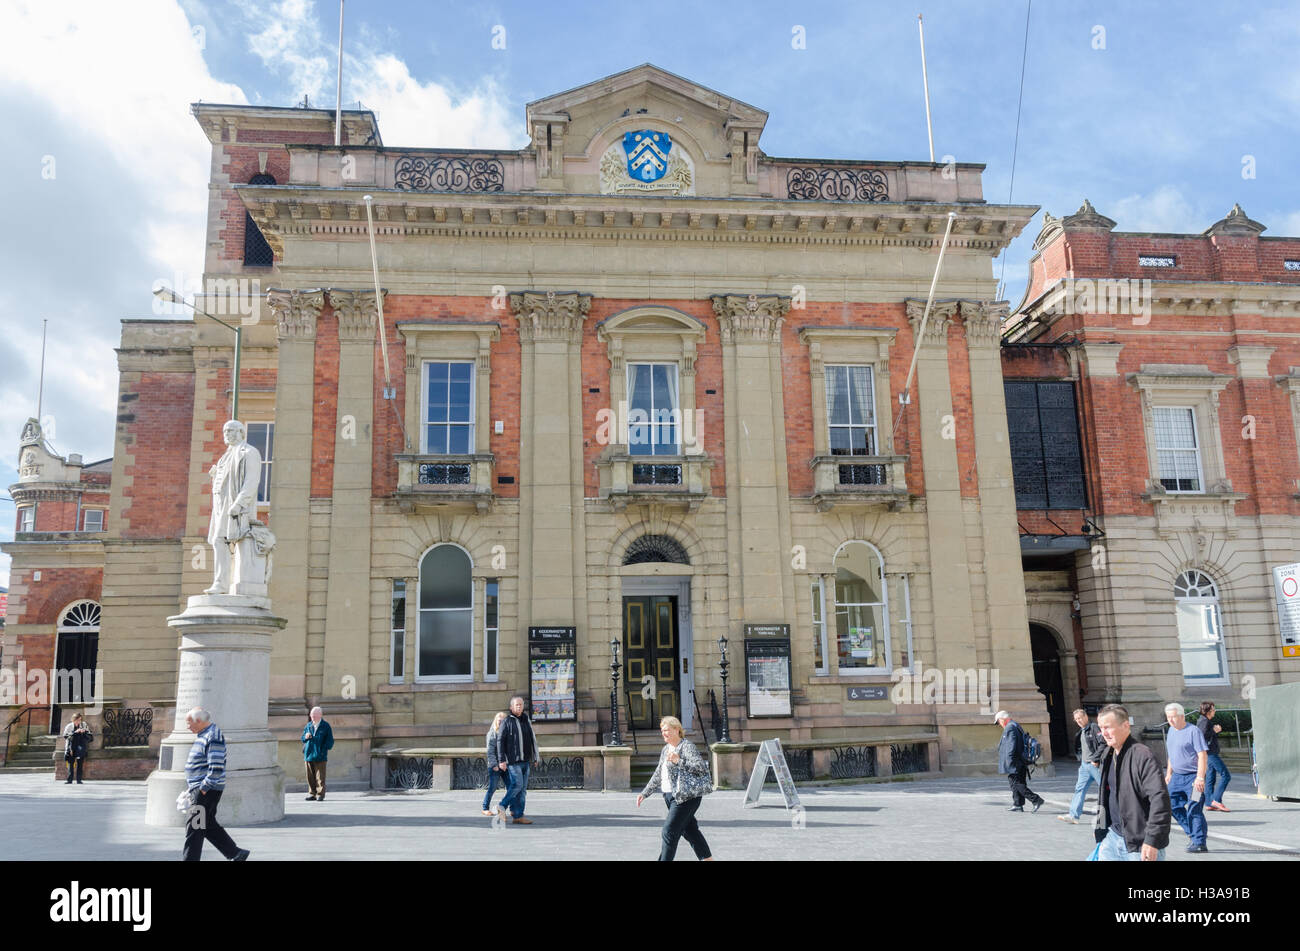 Kidderminster Town Hall - Stock Image